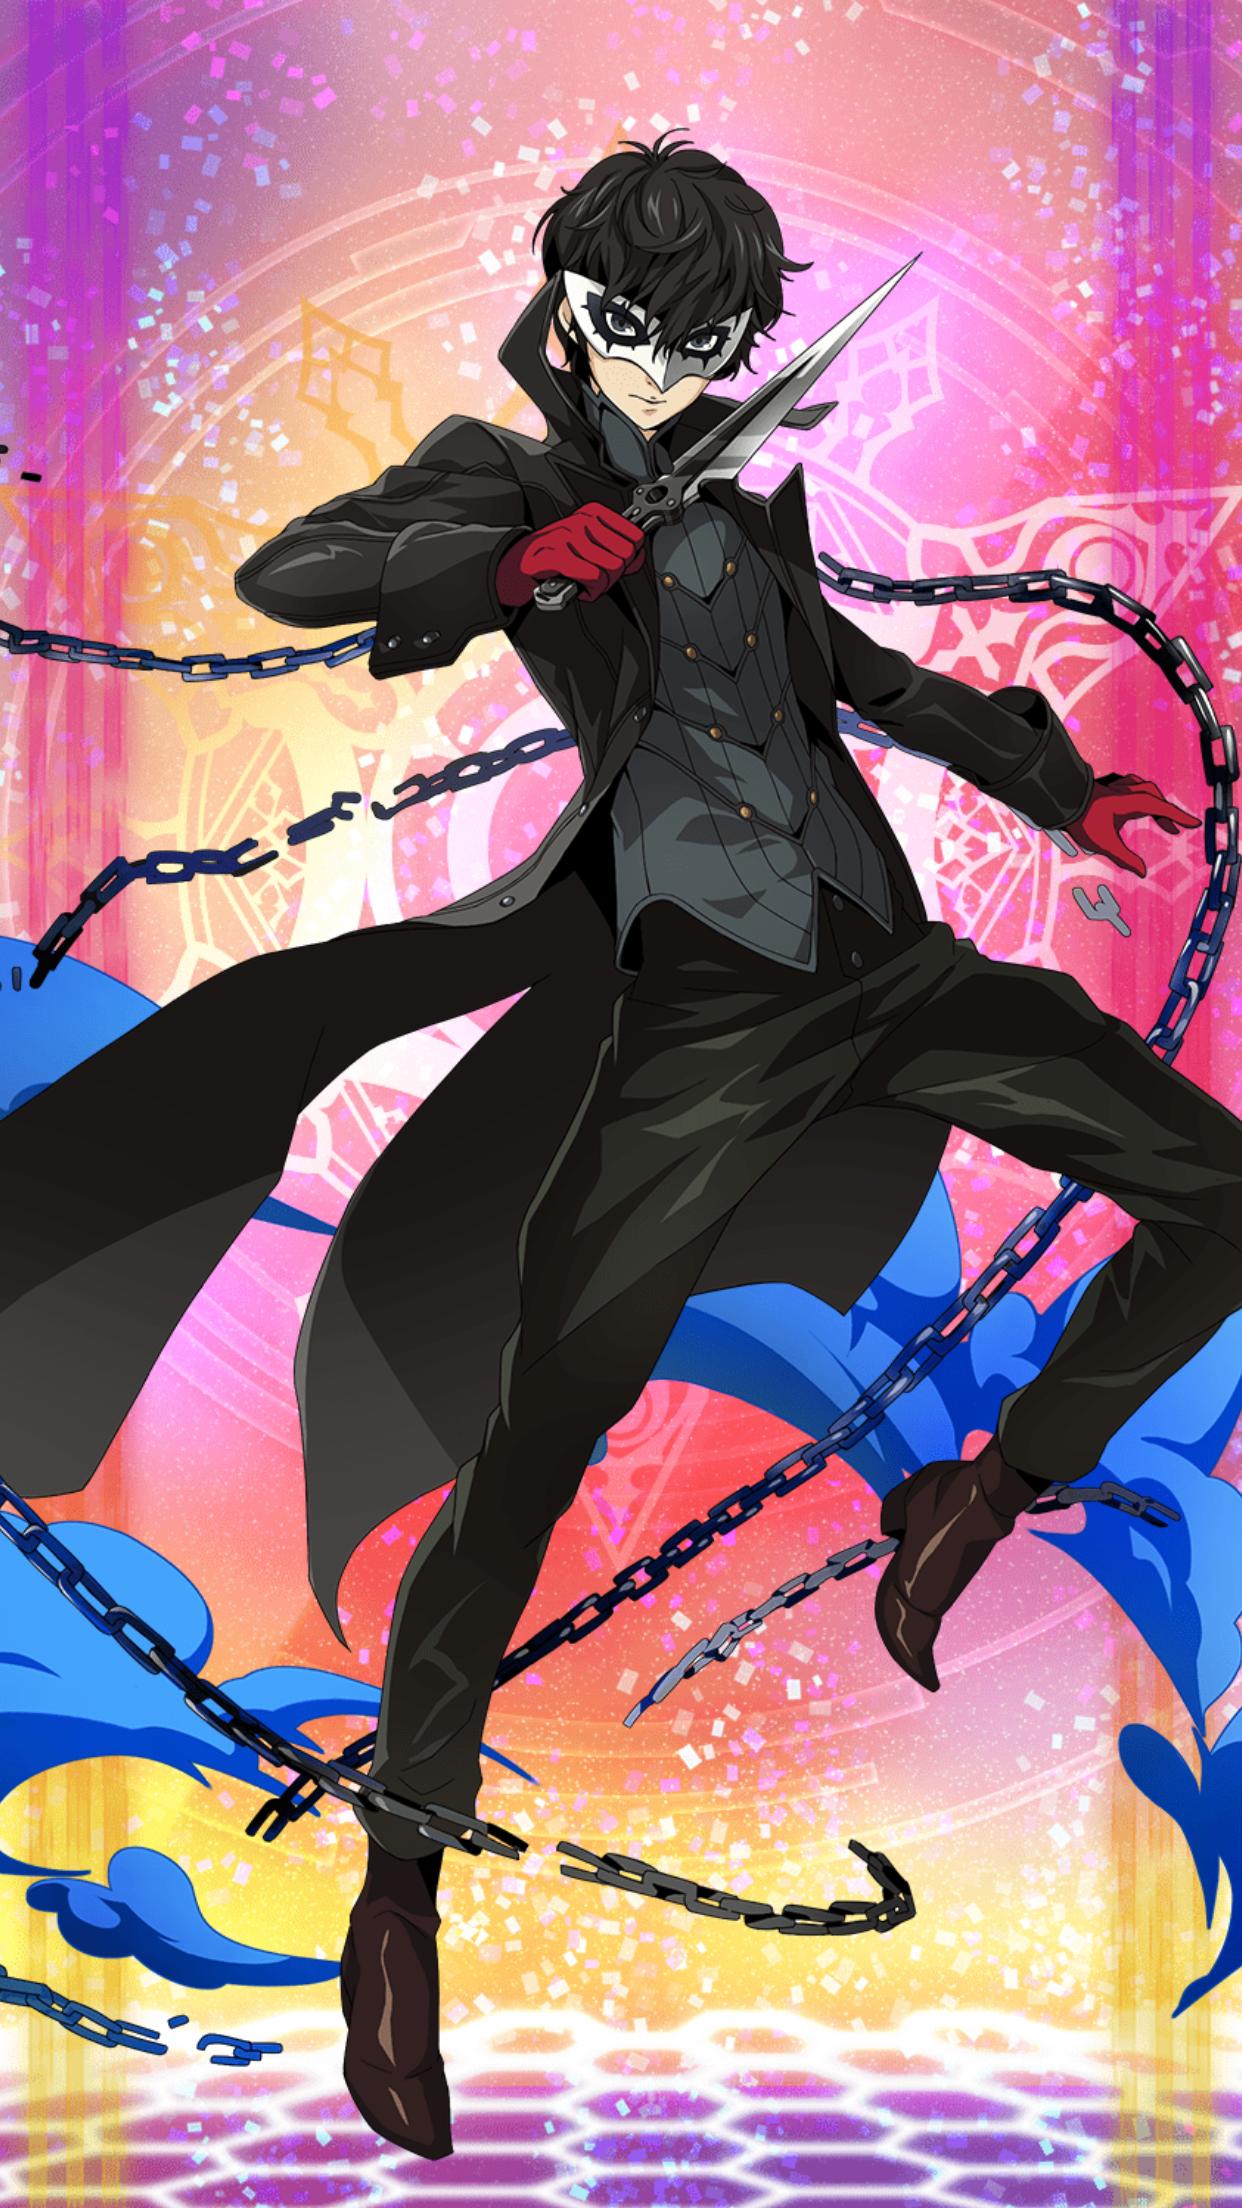 Pin By Anime Hay On Sword Art Online Sword Art Online Persona 5 Joker Akira Kurusu